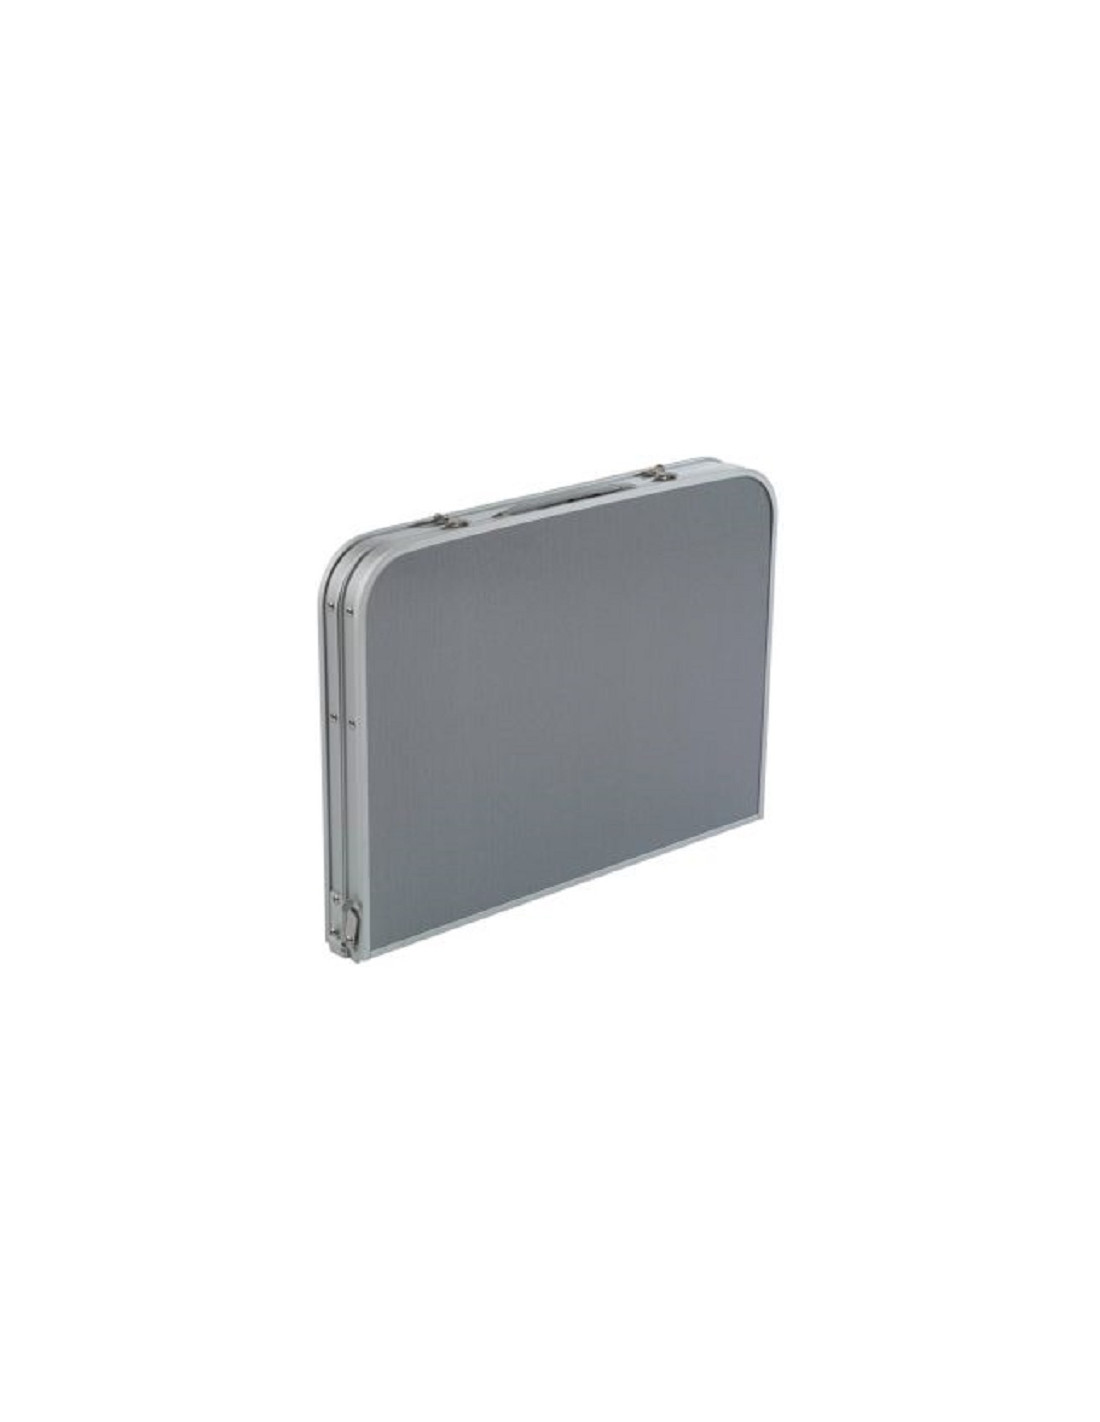 Mesa maleta luxus plegable 90 x 60 cm camp4 tienda de for Mesa de camping plegable de aluminio